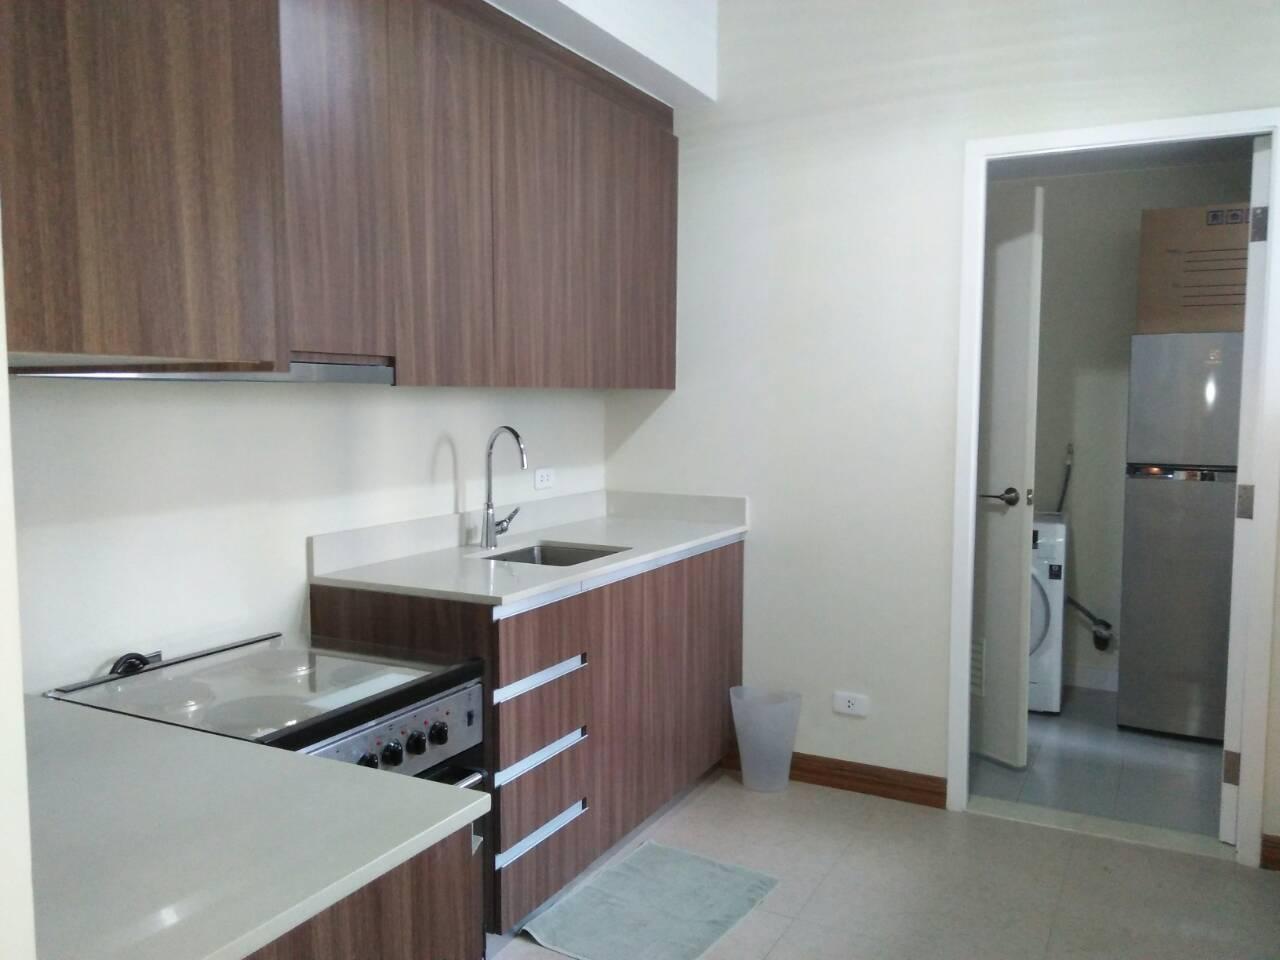 2 Bedrooms Condo, Shang Salcedo Place Kitchen